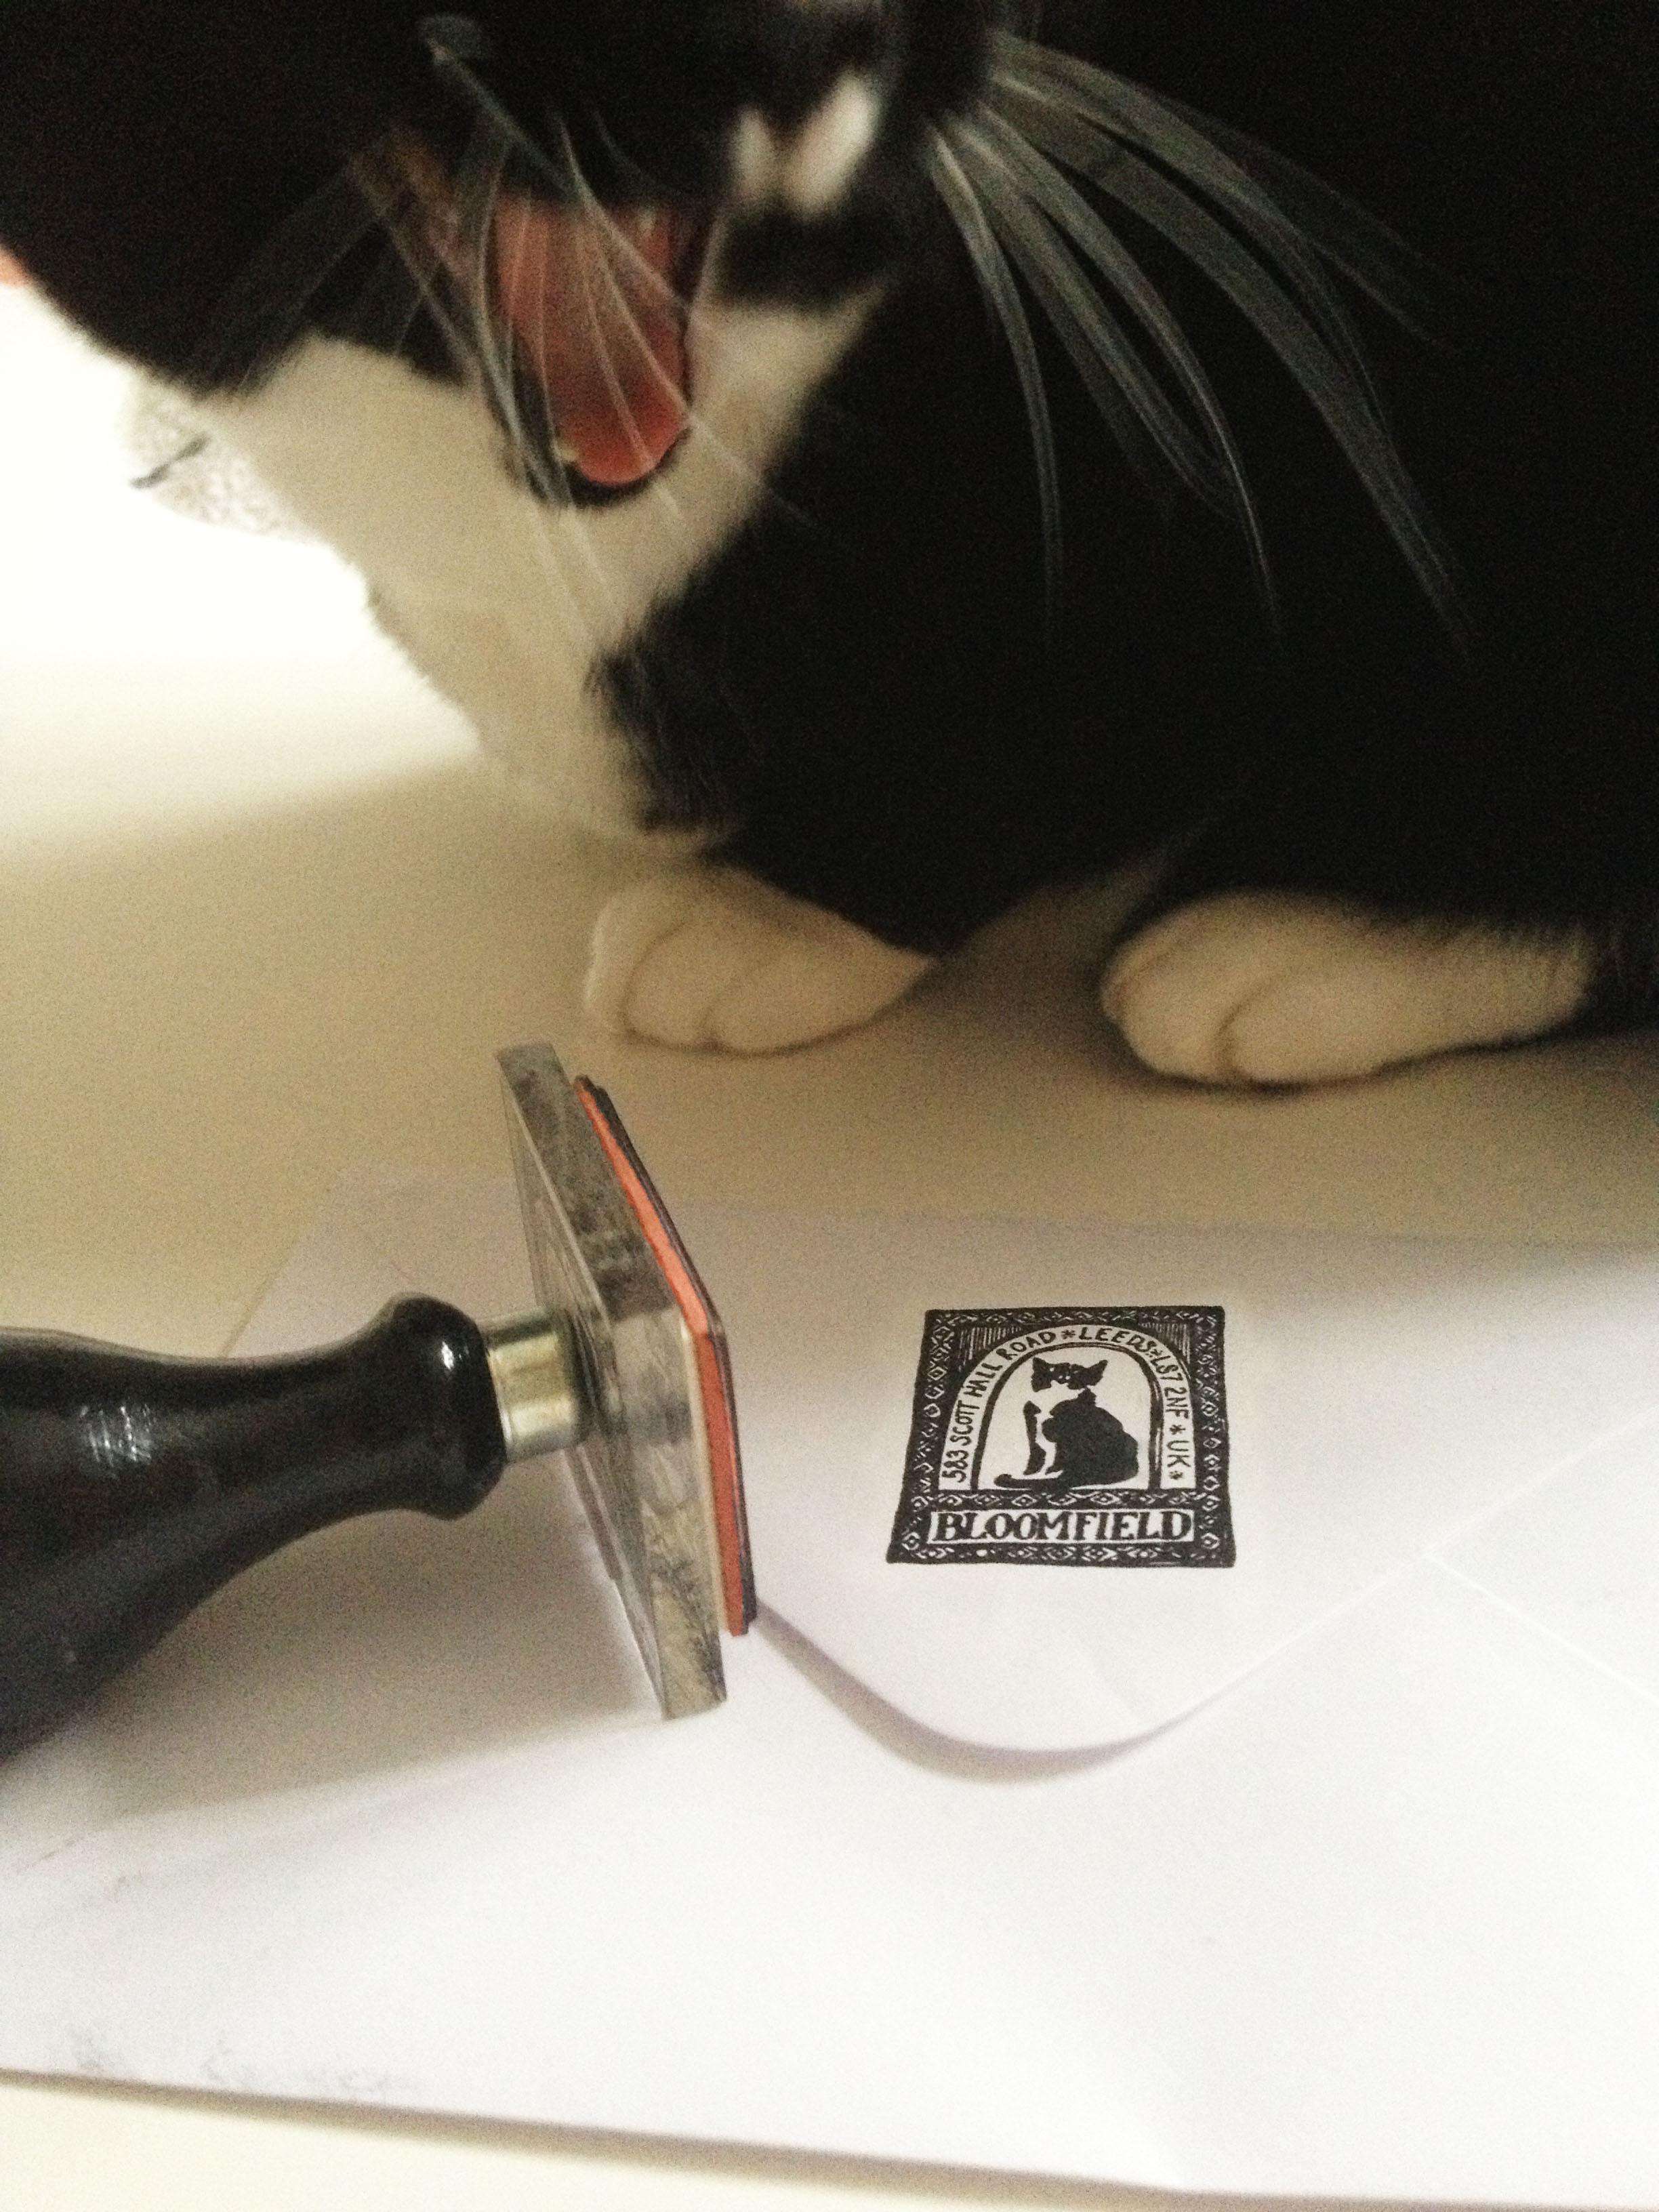 Pops_cat stamp.jpg